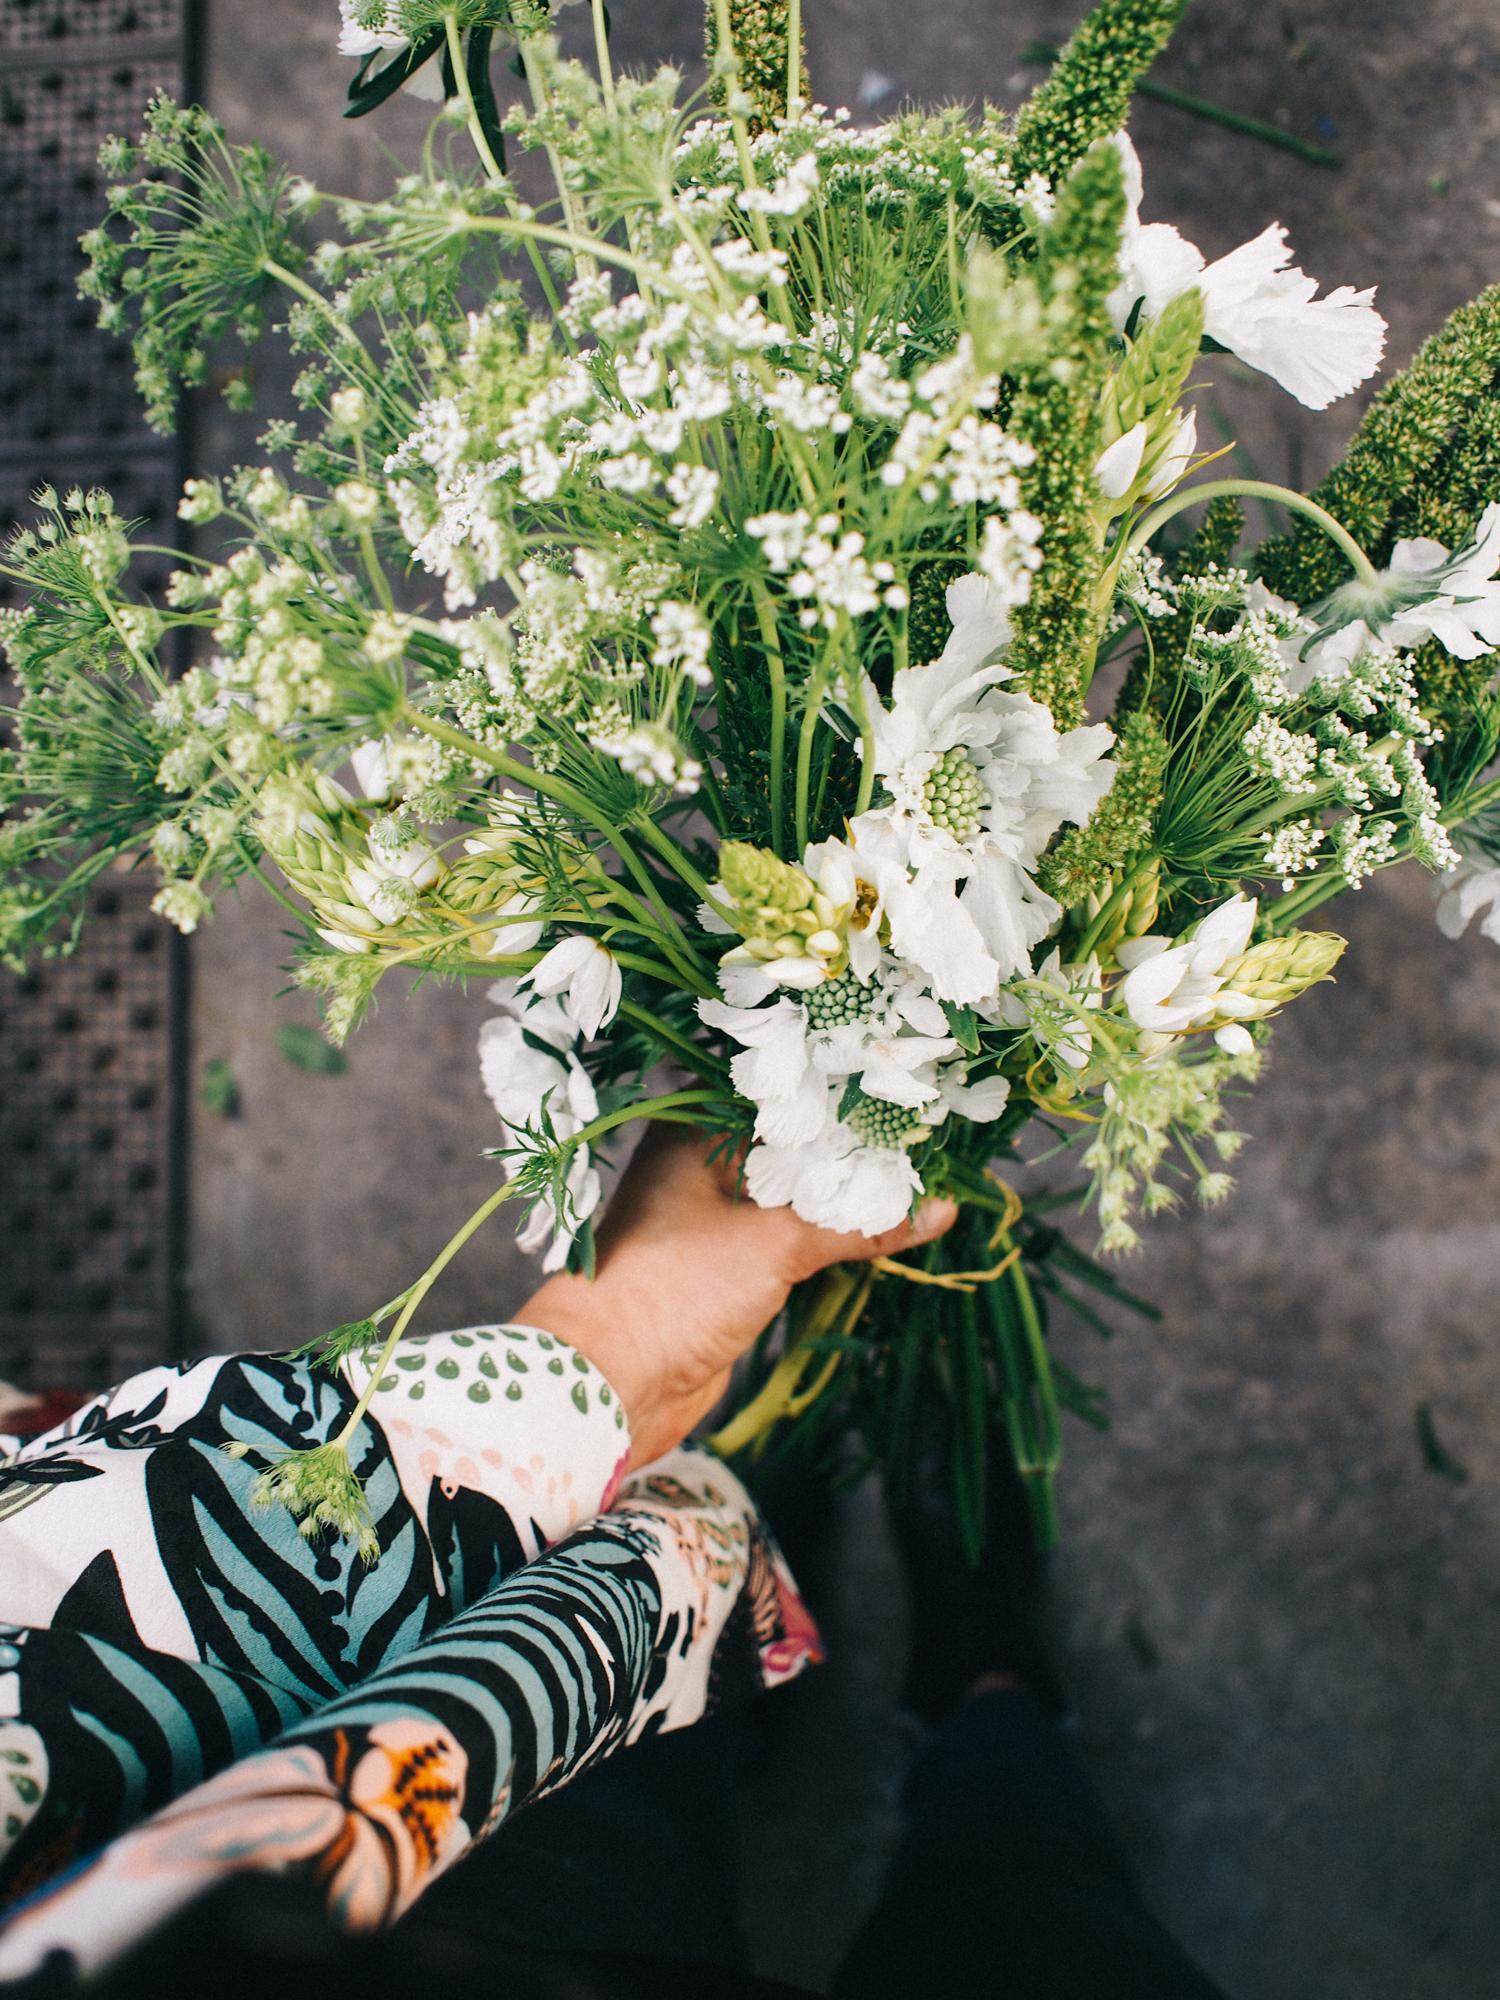 A simple bouquet built of fresh blooms from the flower farm | A Fabulous Fete